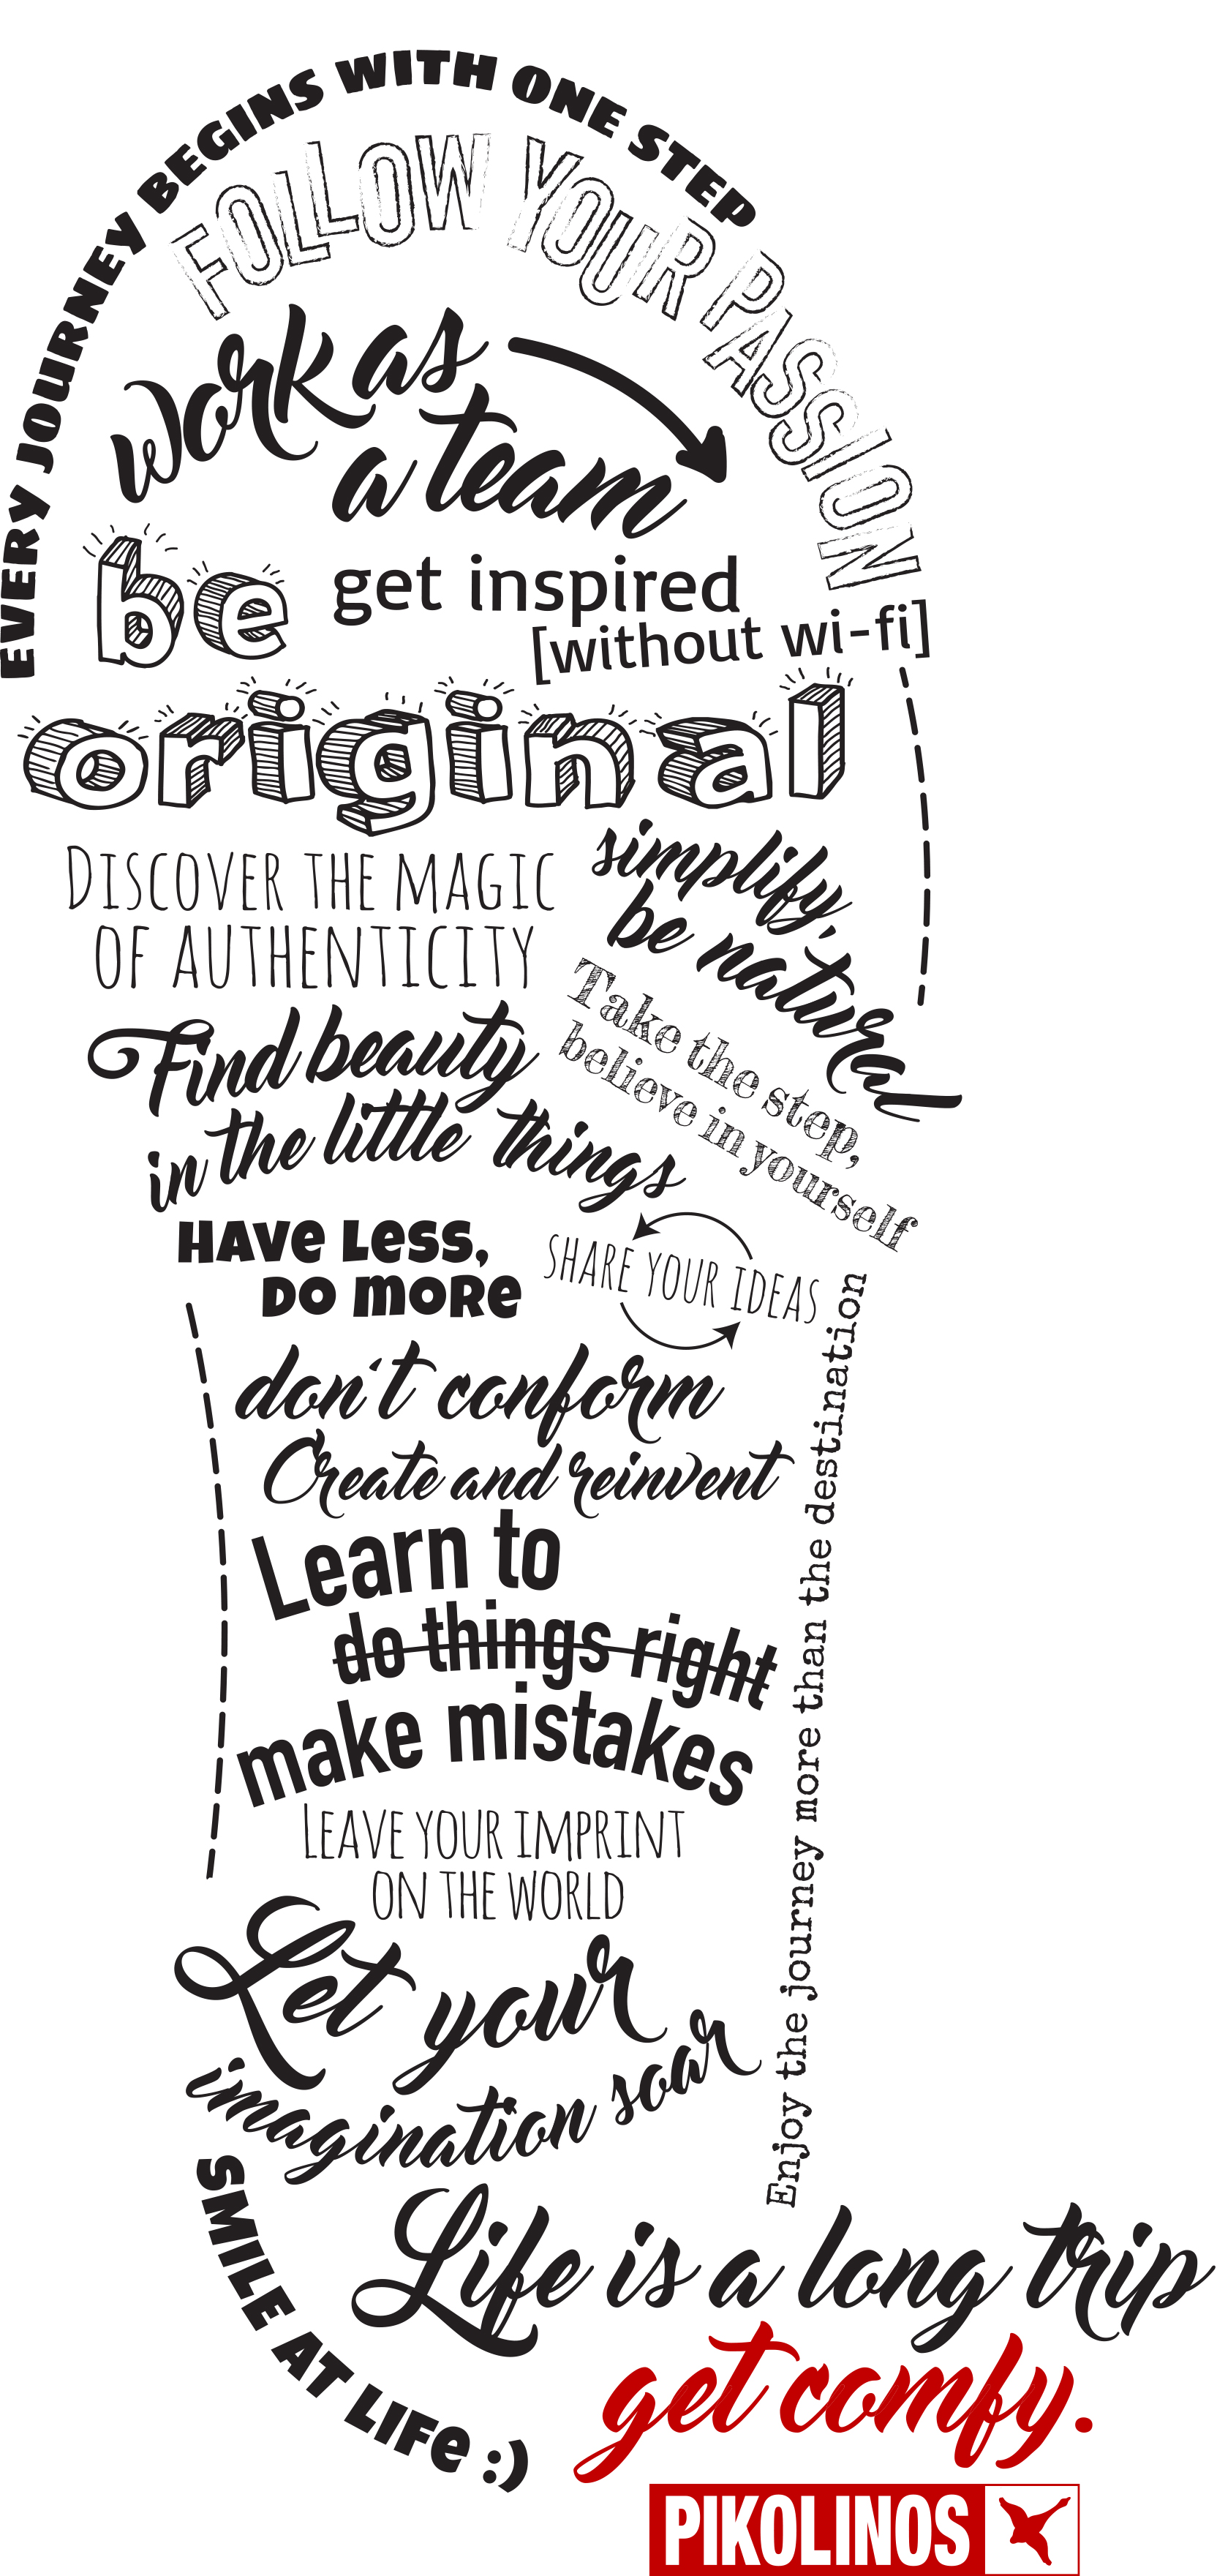 The Happy Creators' Manifesto